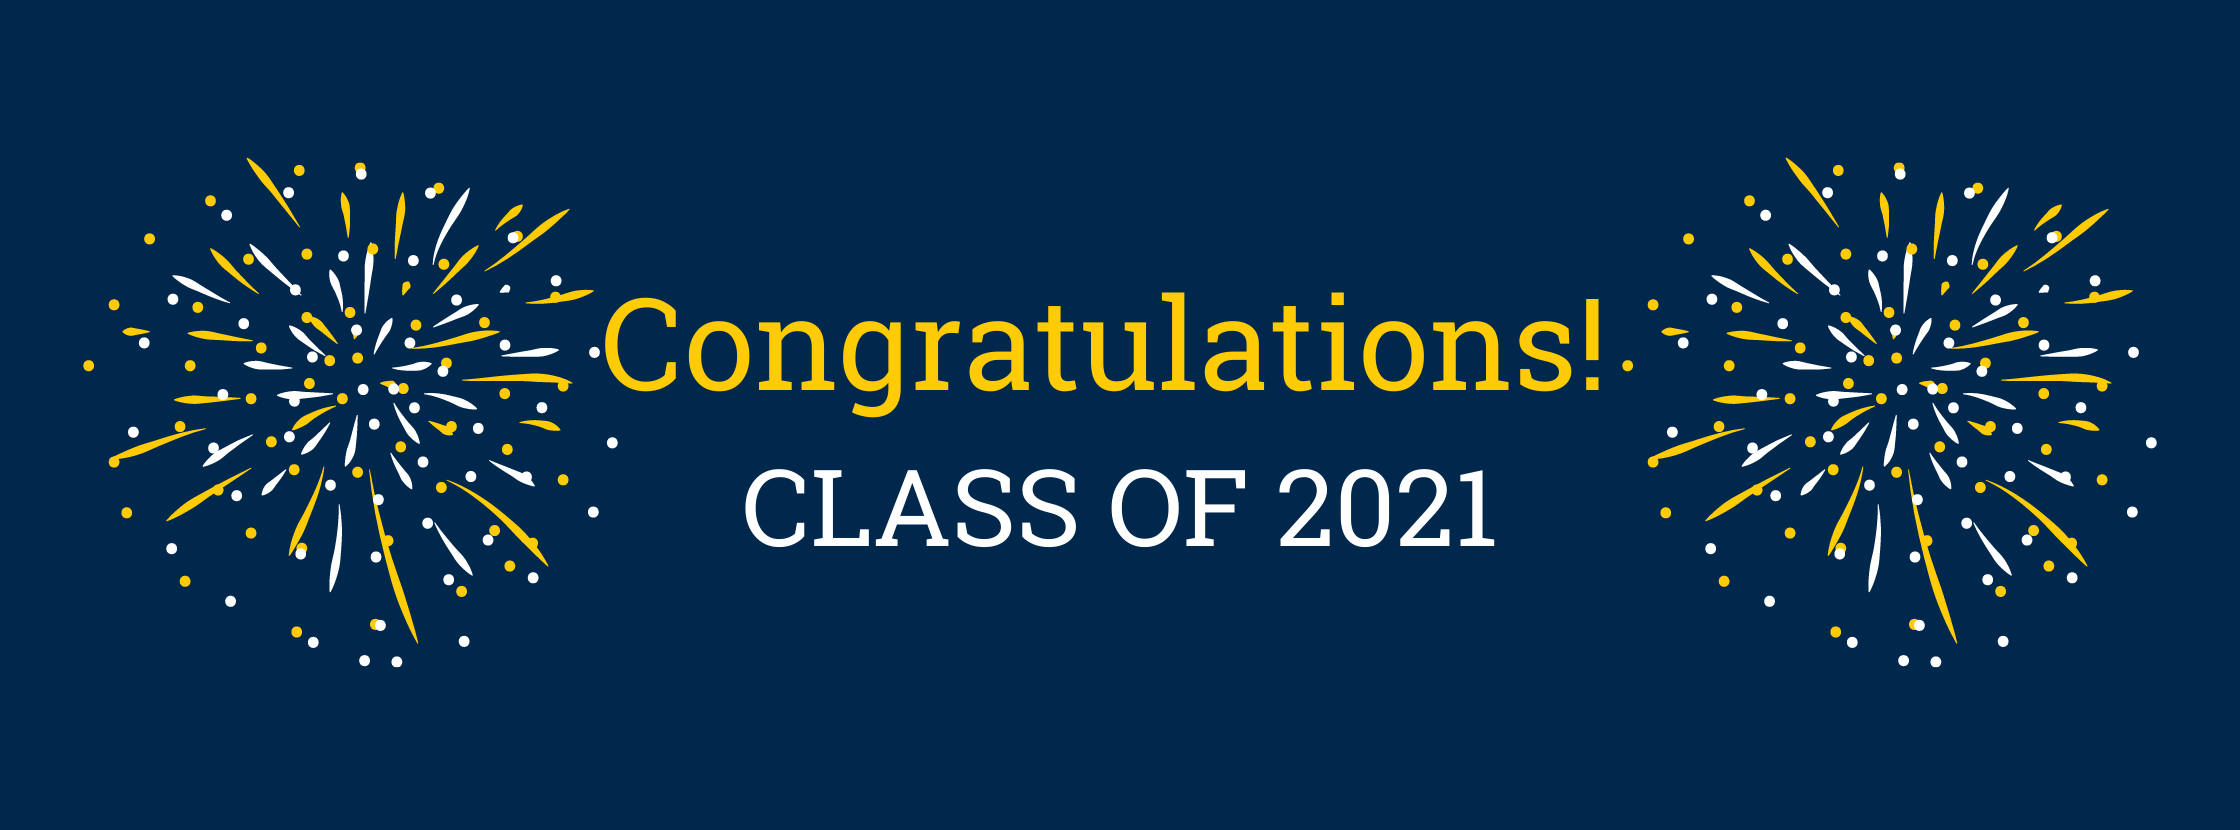 Congratulations! Class of 2021